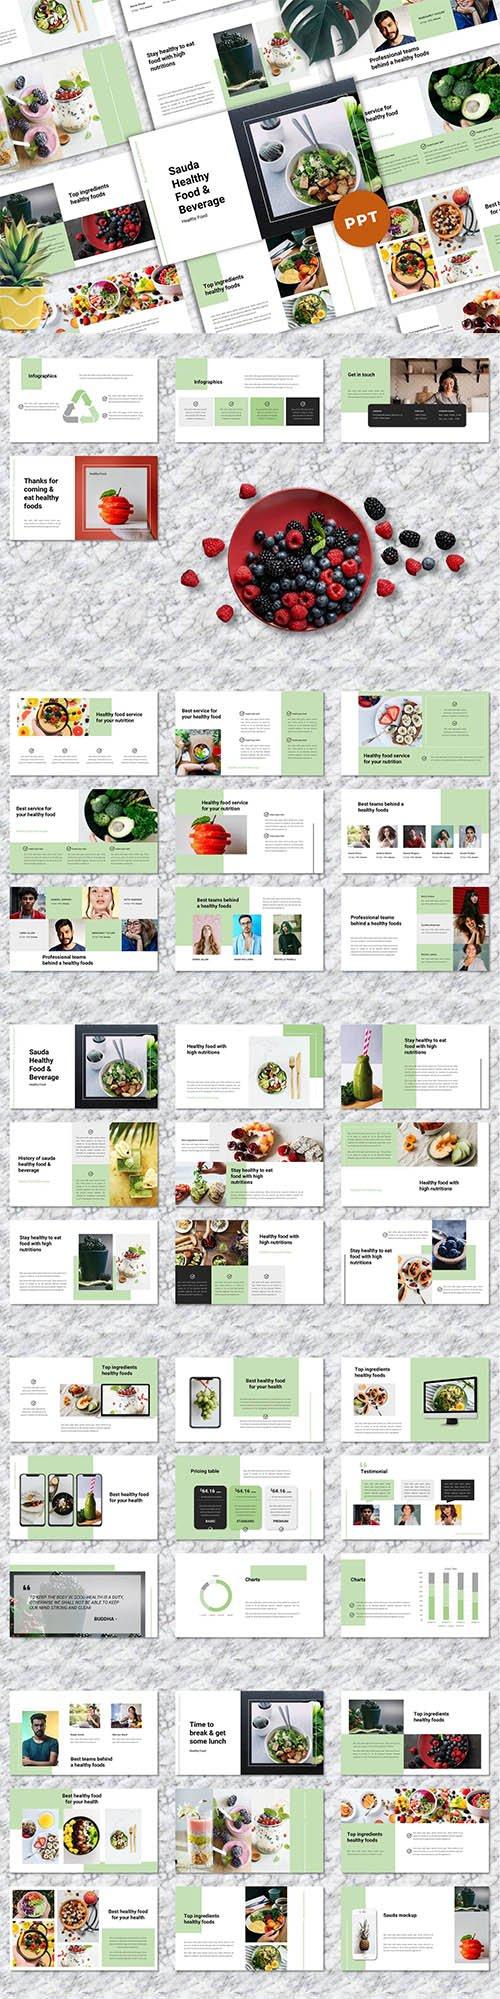 Sauda - Food & Beverages Powerpoint Templates